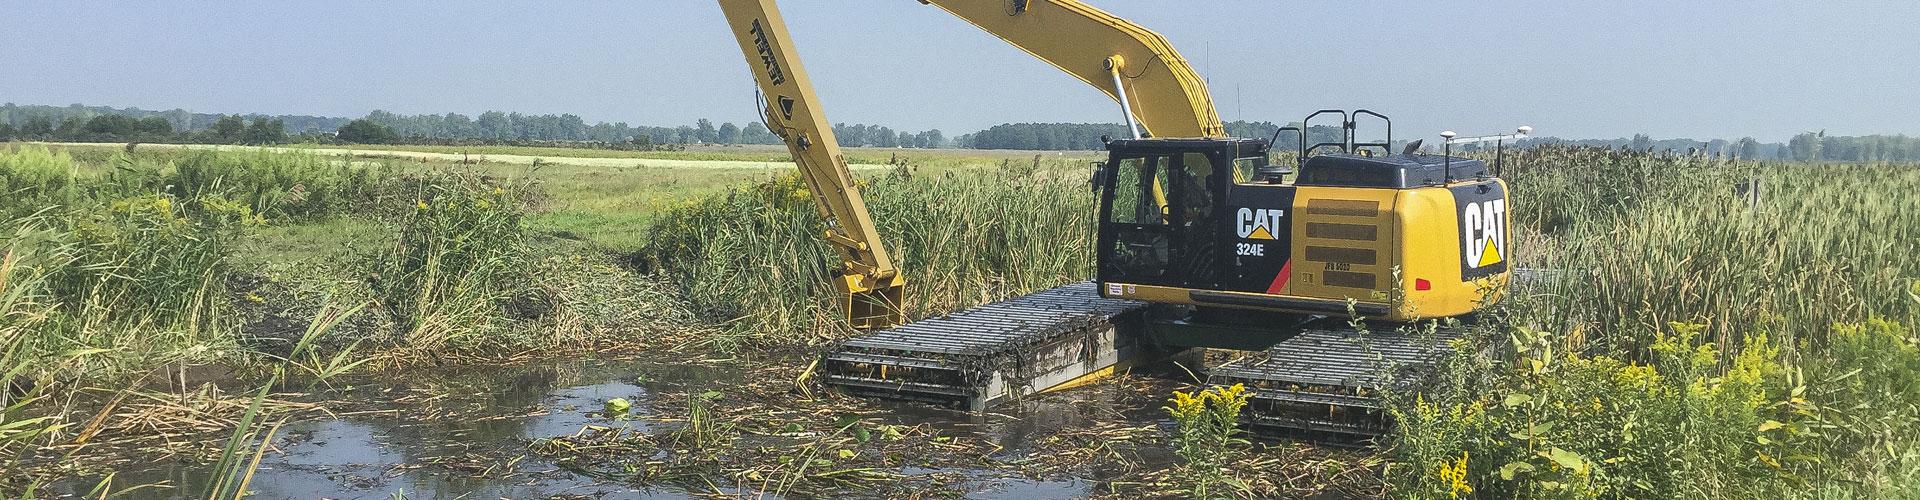 Wetland remediation, wetland dredging, impacted sediment removal, wetland restoration, marsh restoration